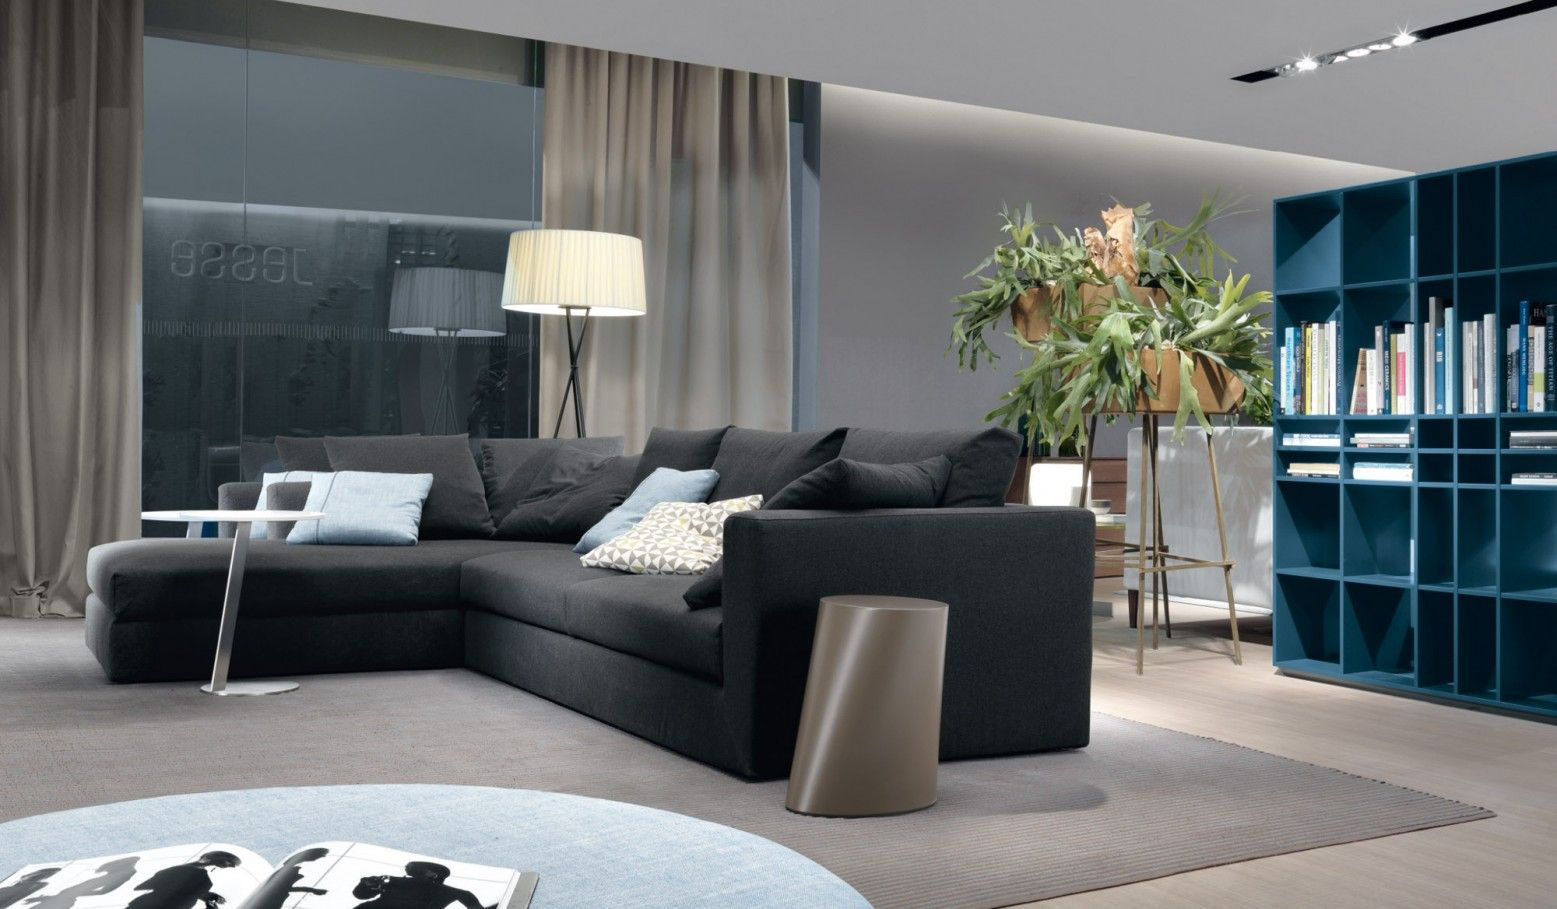 LuxDeco.com Luxury Furniture, Designer Homeware, Accessories U0026 Gifts